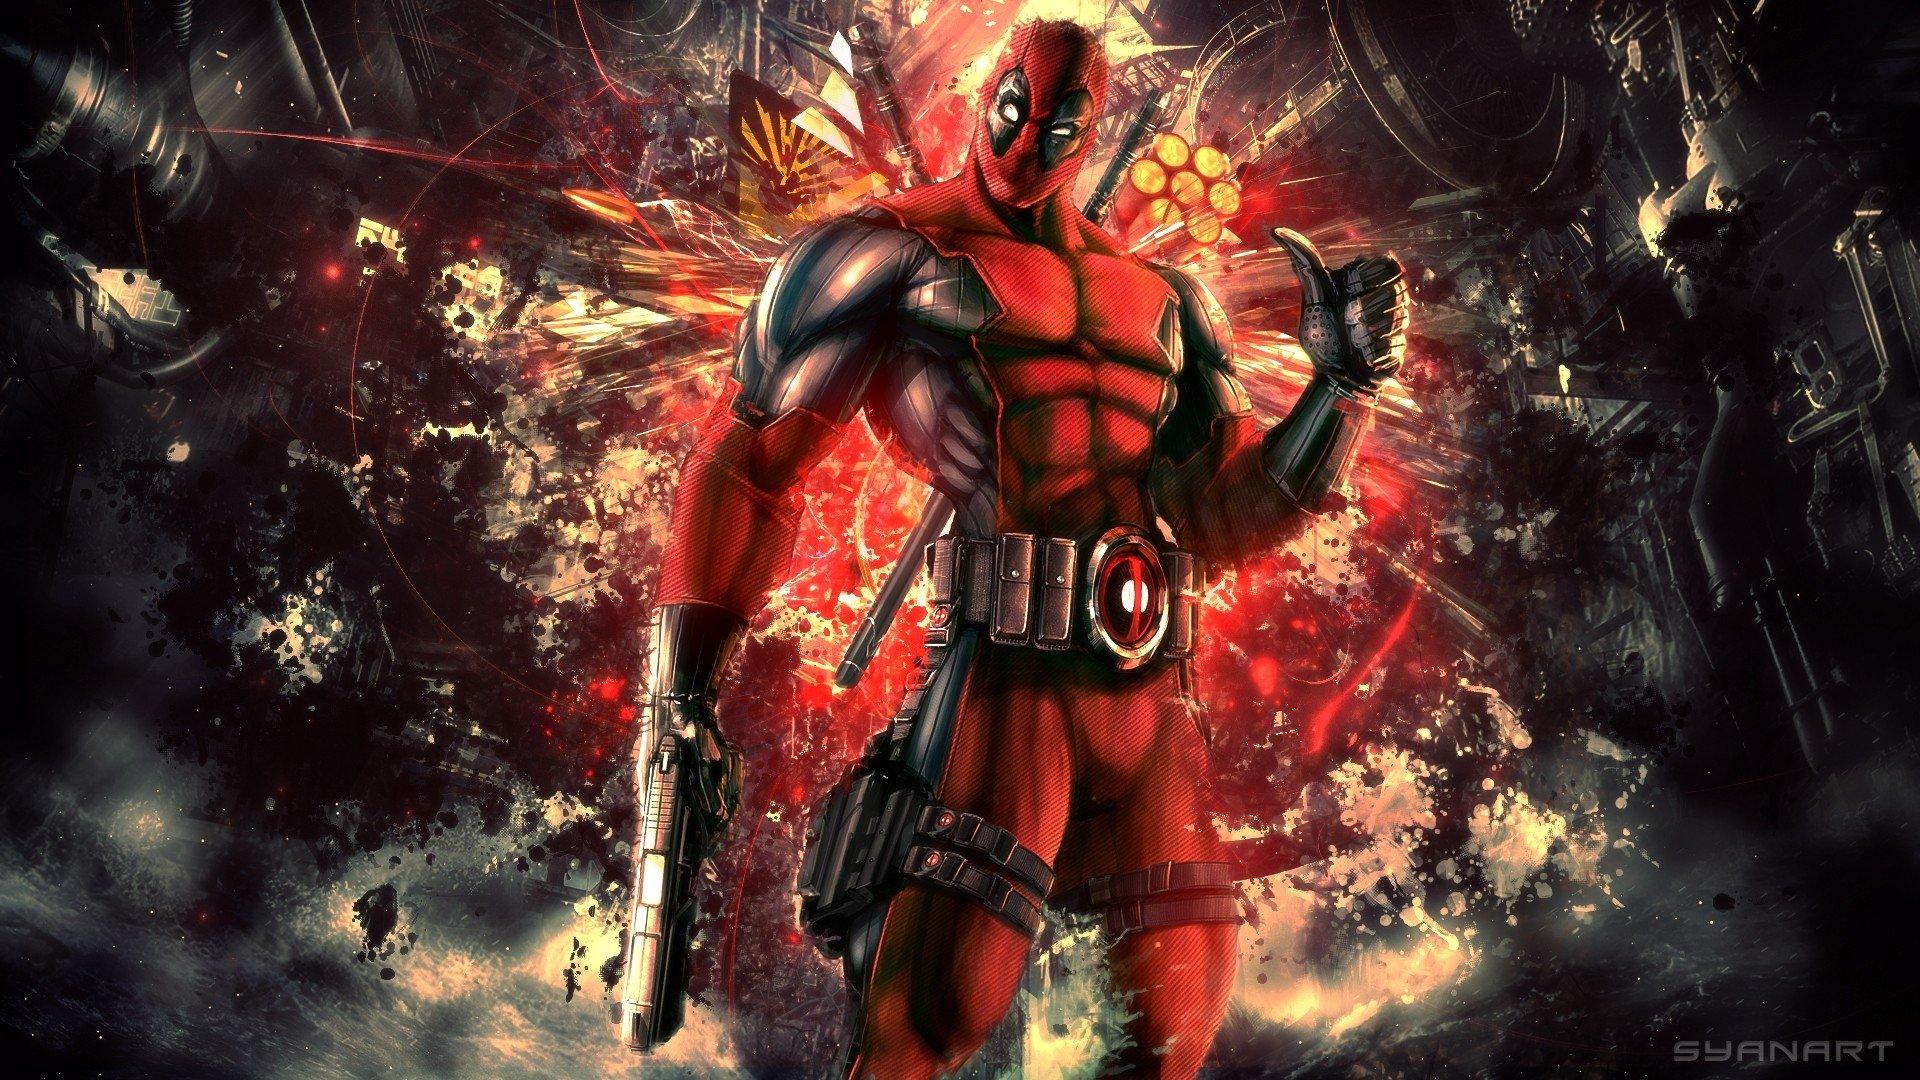 719 Deadpool HD Wallpapers | Backgrounds - Wallpaper Abyss